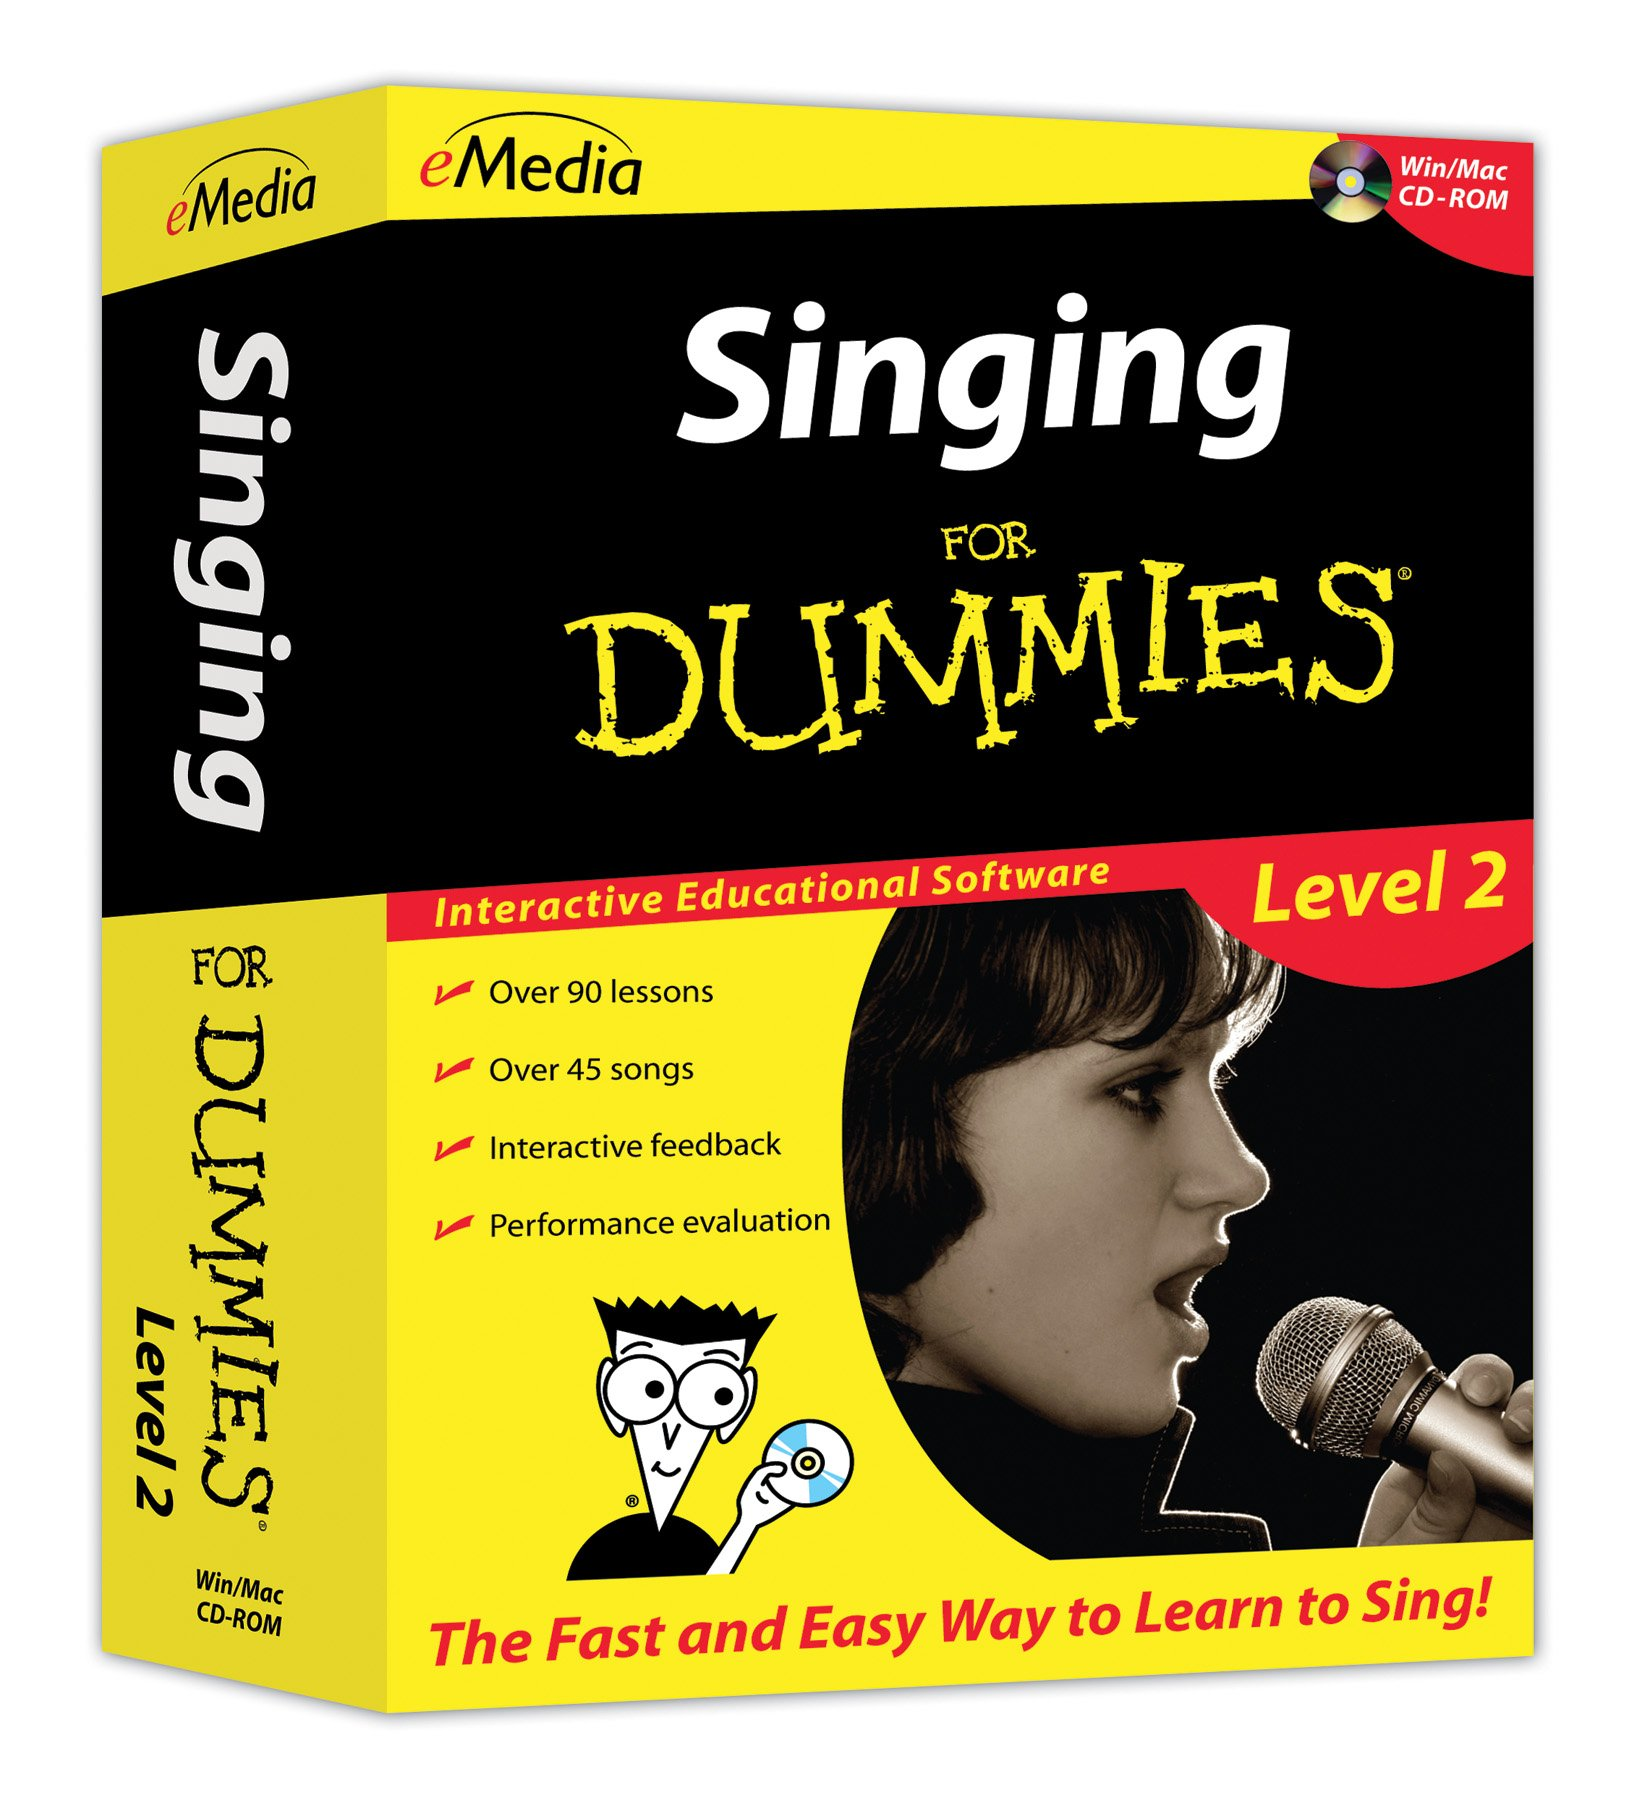 eMedia Singing For Dummies Level 2